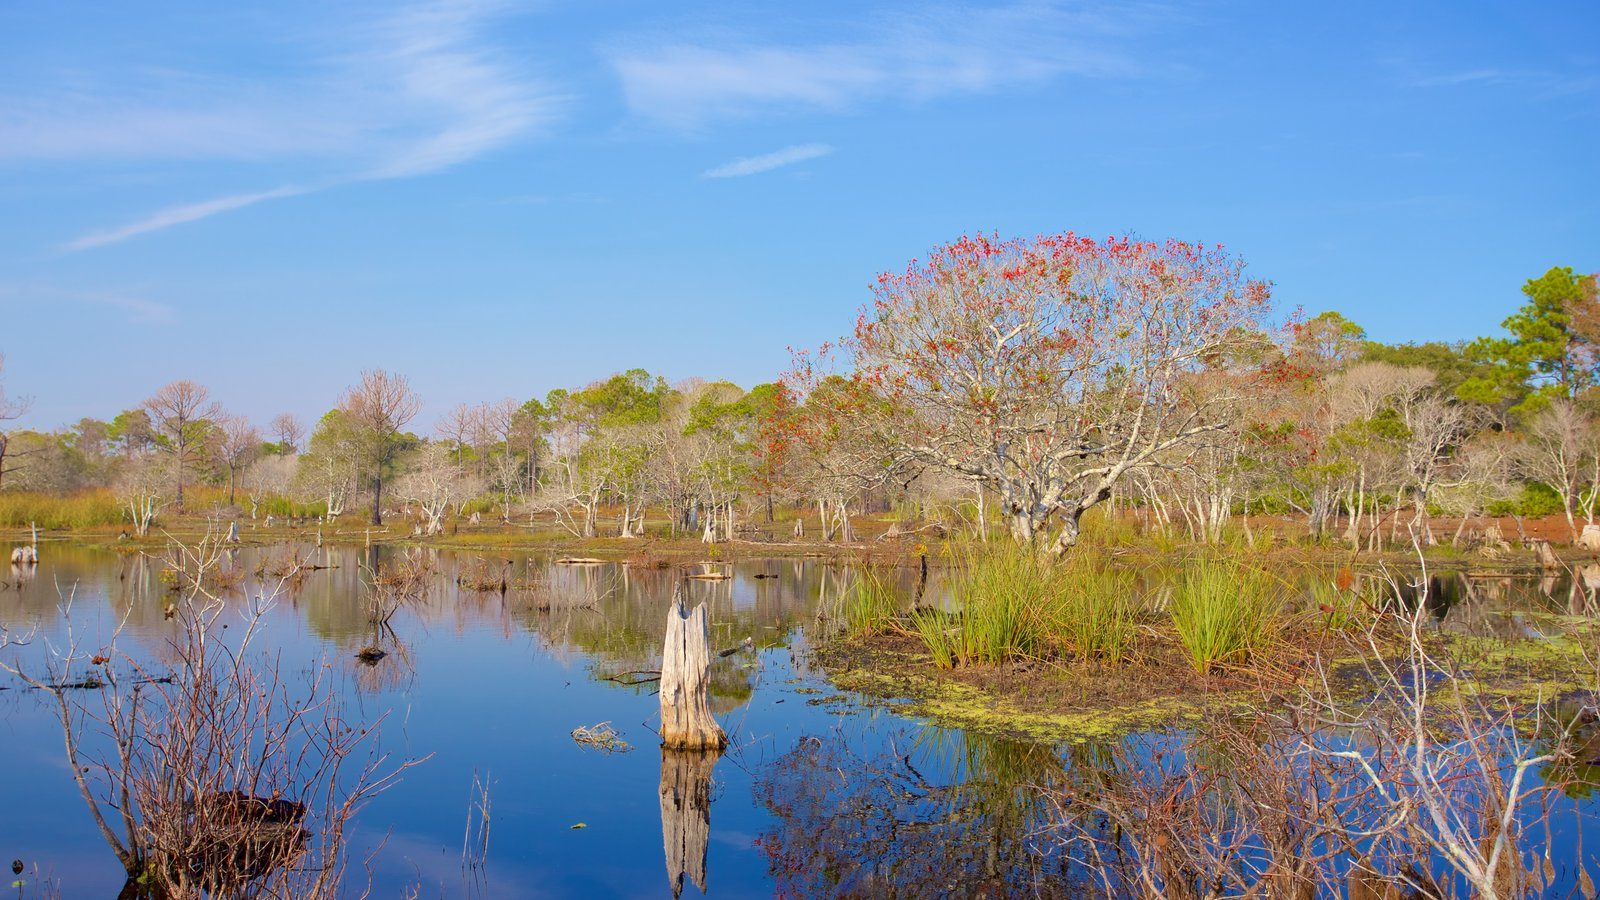 St. Andrews State Park caracterizando pântano e cenas tranquilas